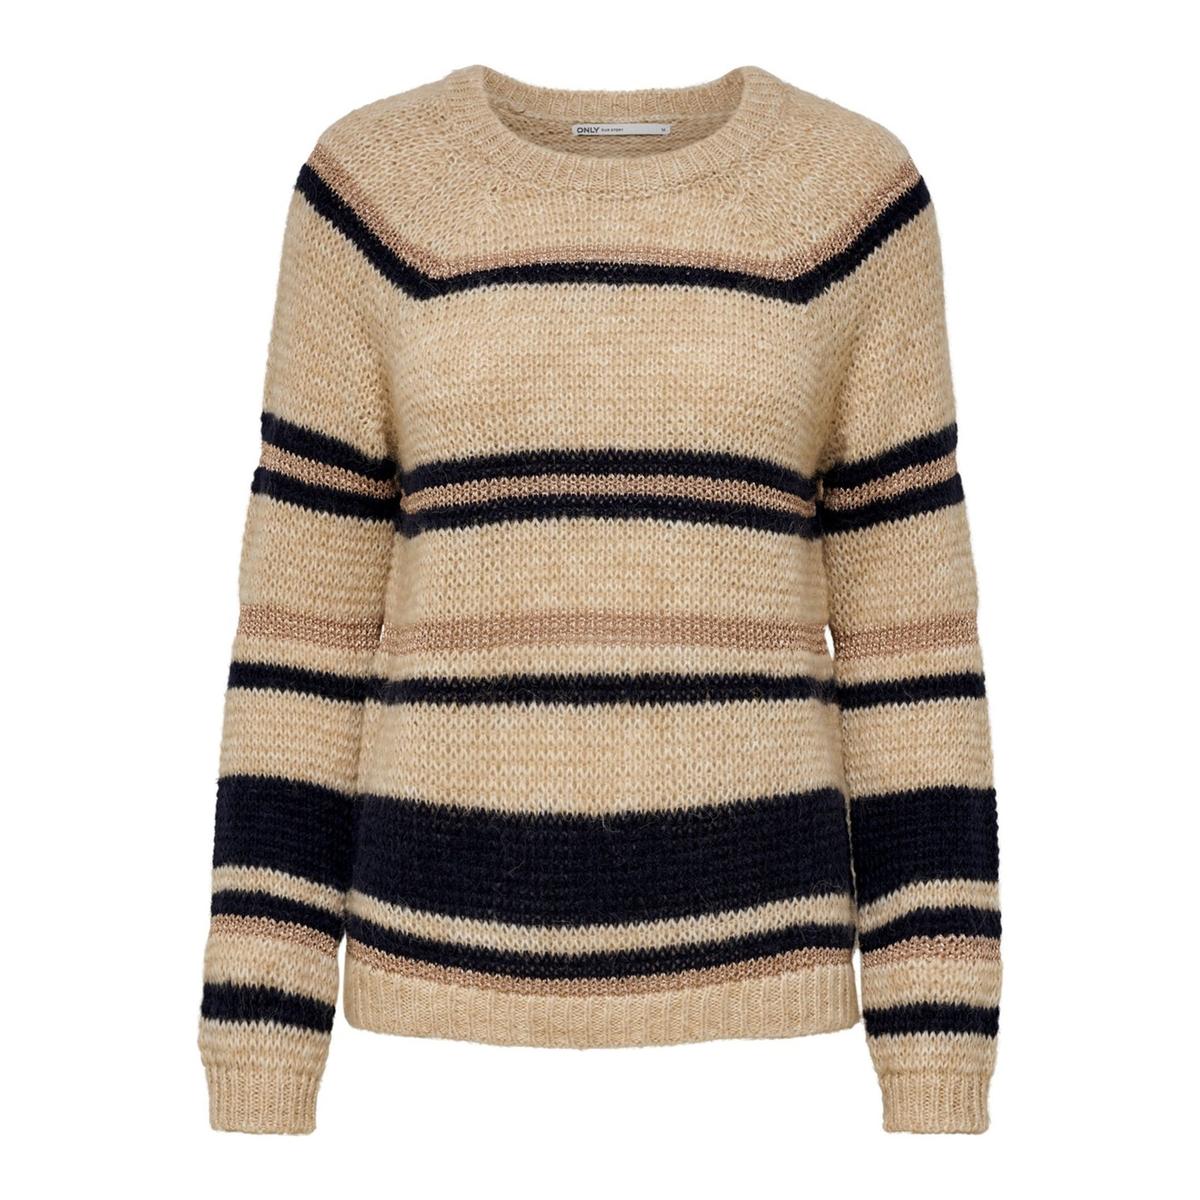 Пуловер La Redoute В полоску из плотного трикотажа XS бежевый lbellagiovanna redfushia белый бежевый xs